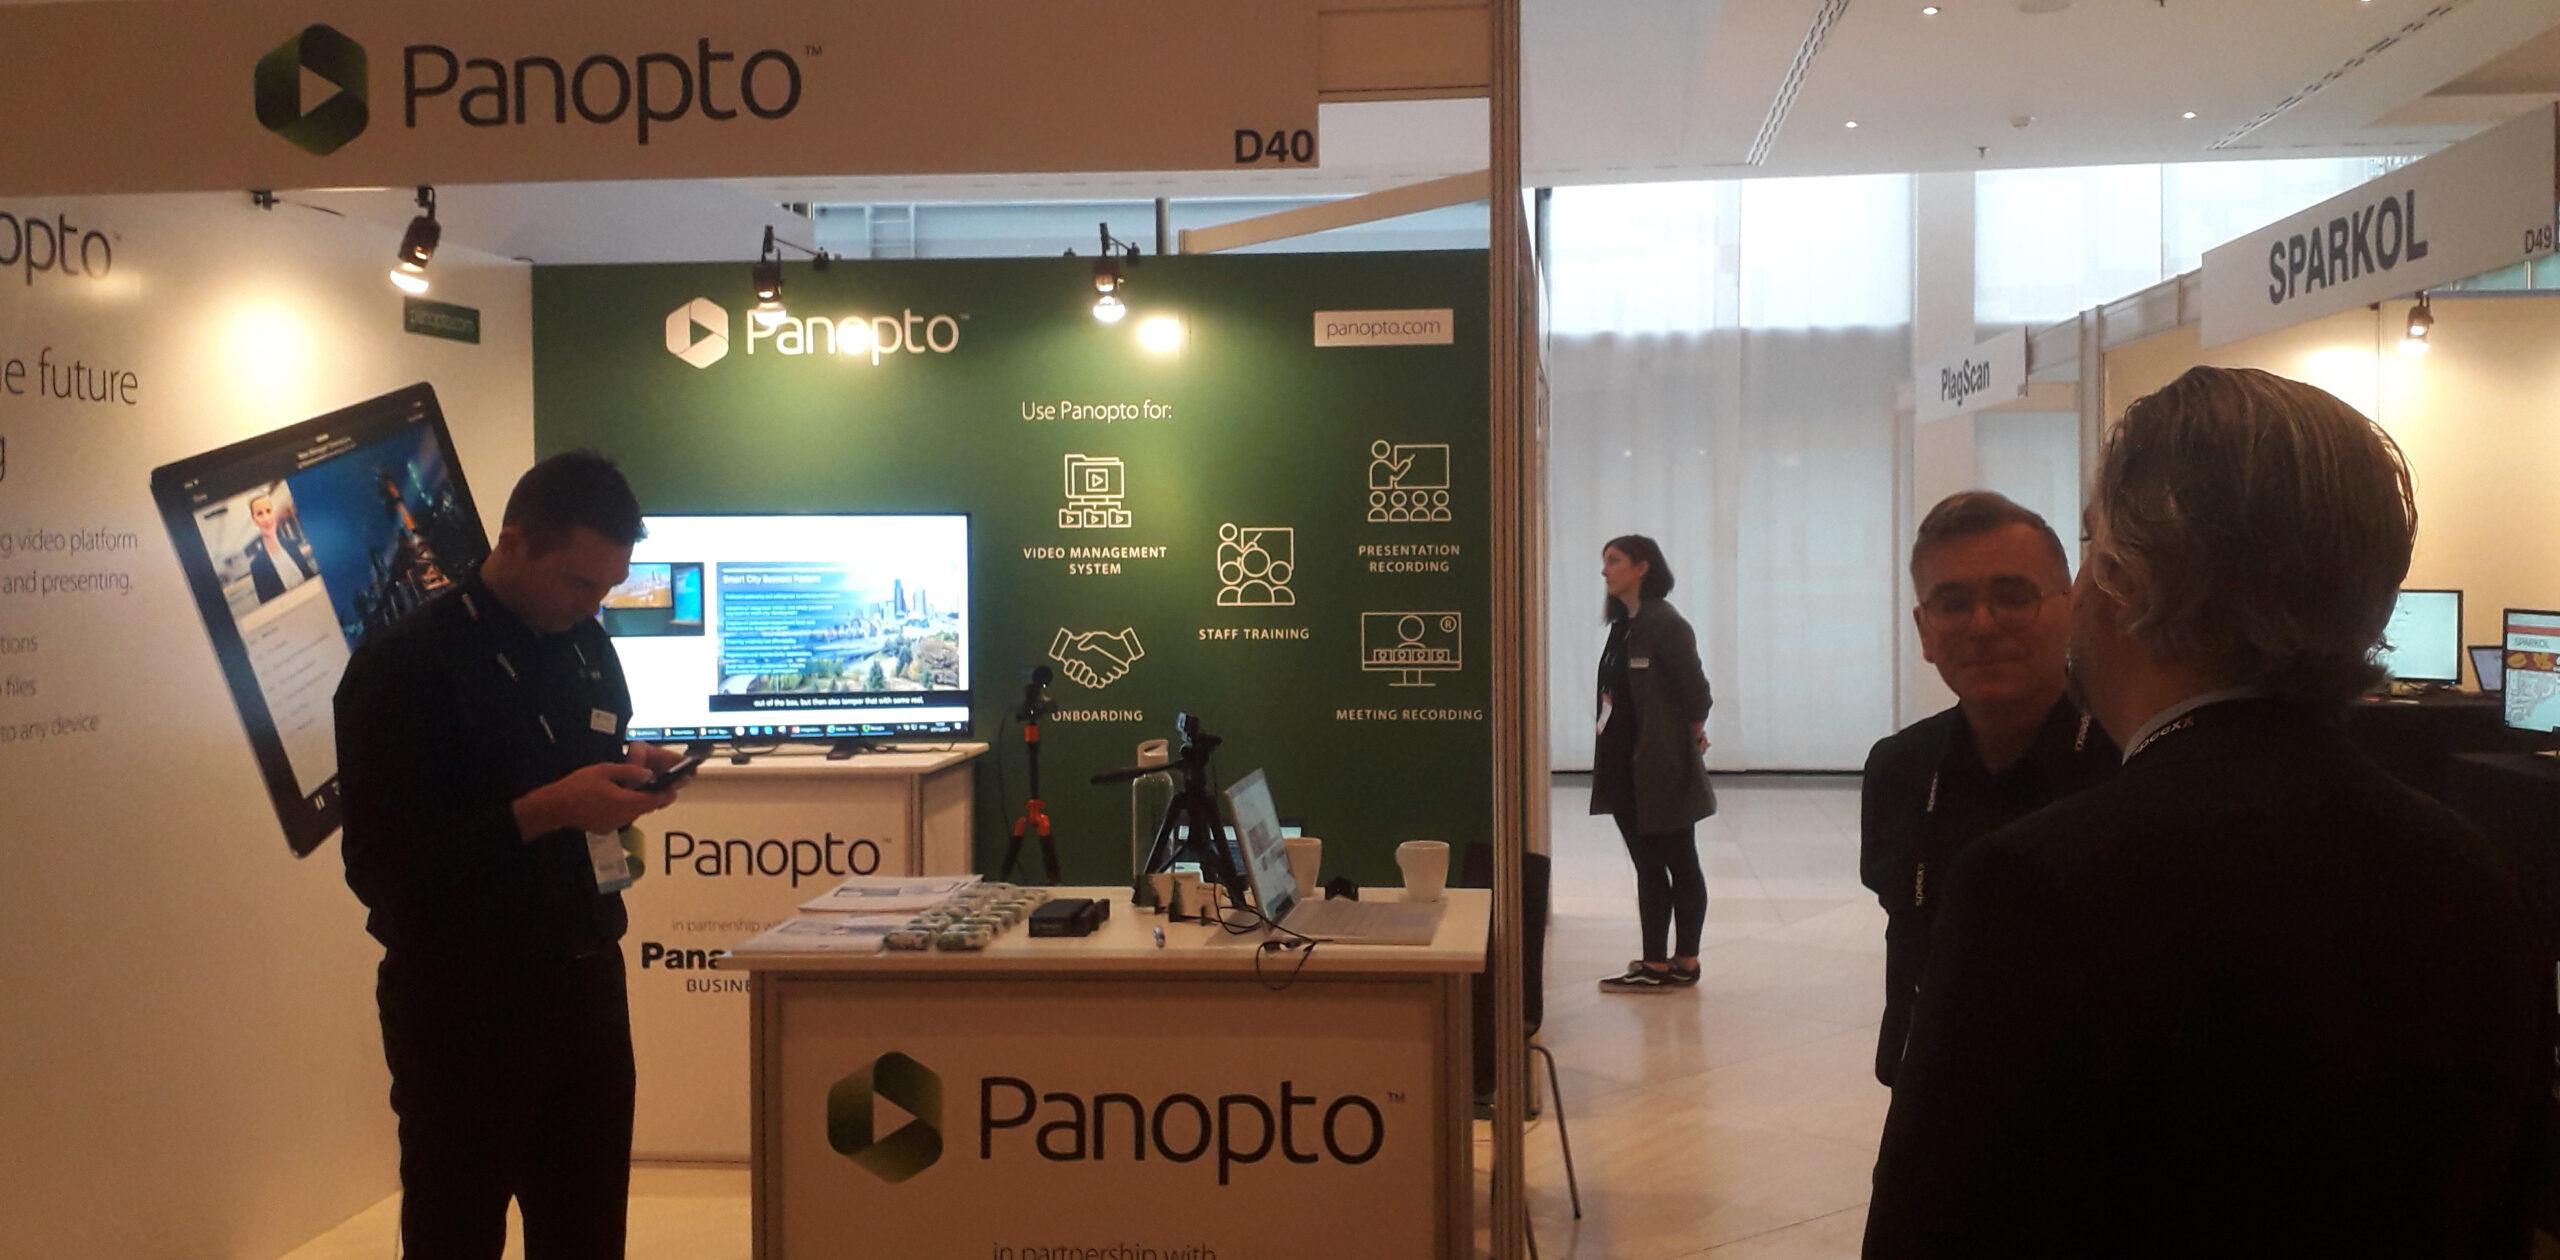 Panopto stand at Online Educa Berlin 2019. Photo credit - RepresentEdTech